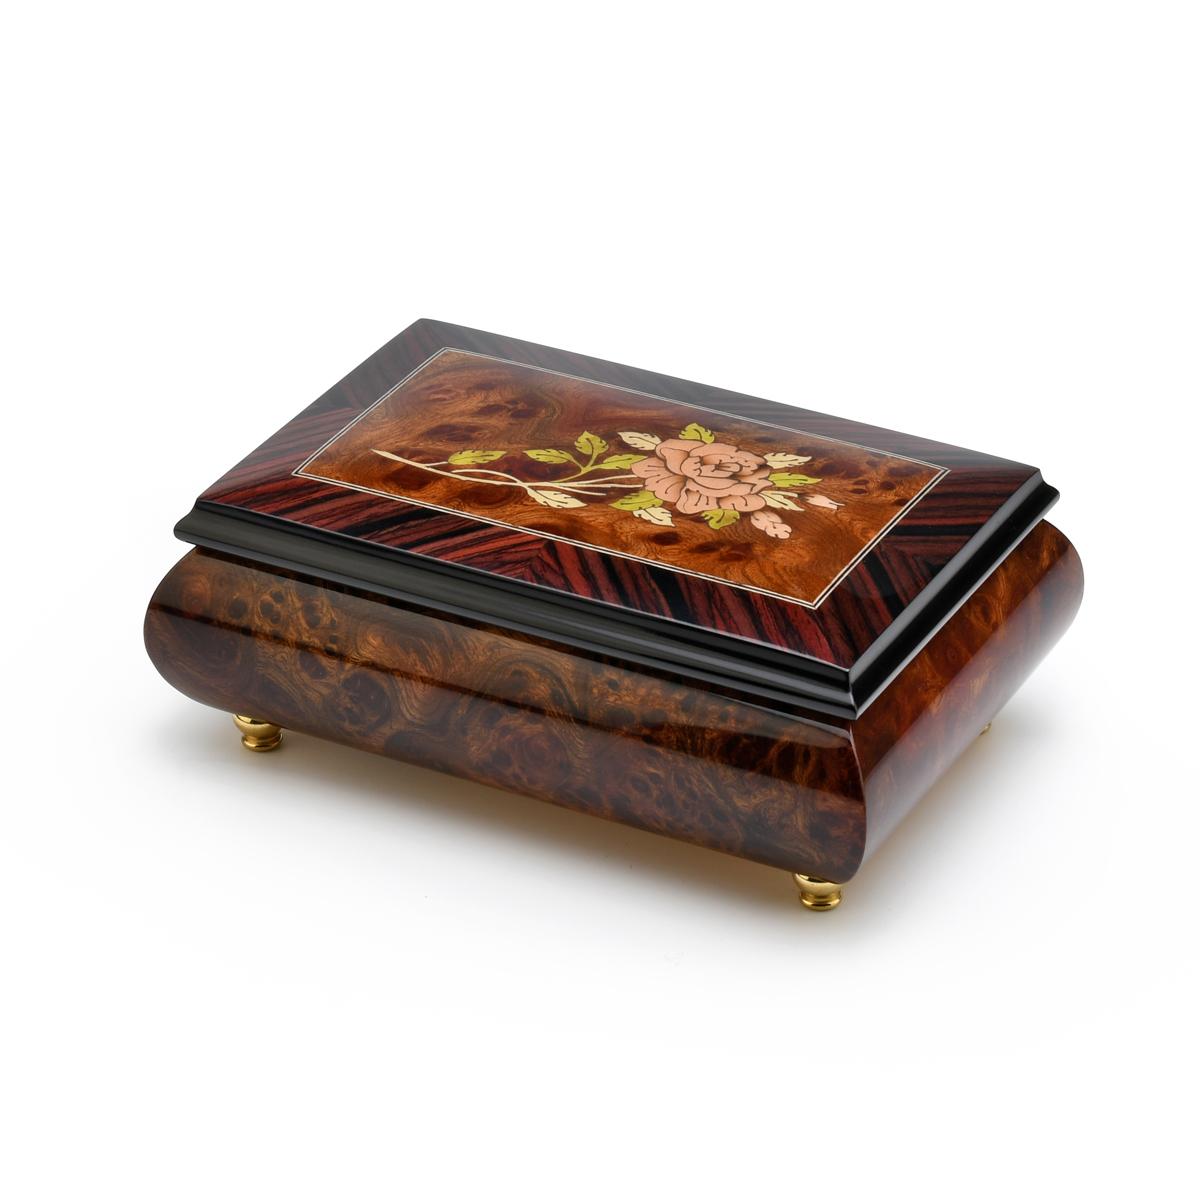 Gorgeous 18 Note Handmade Burl-Walnut Music Box with Pink Rose Inlay